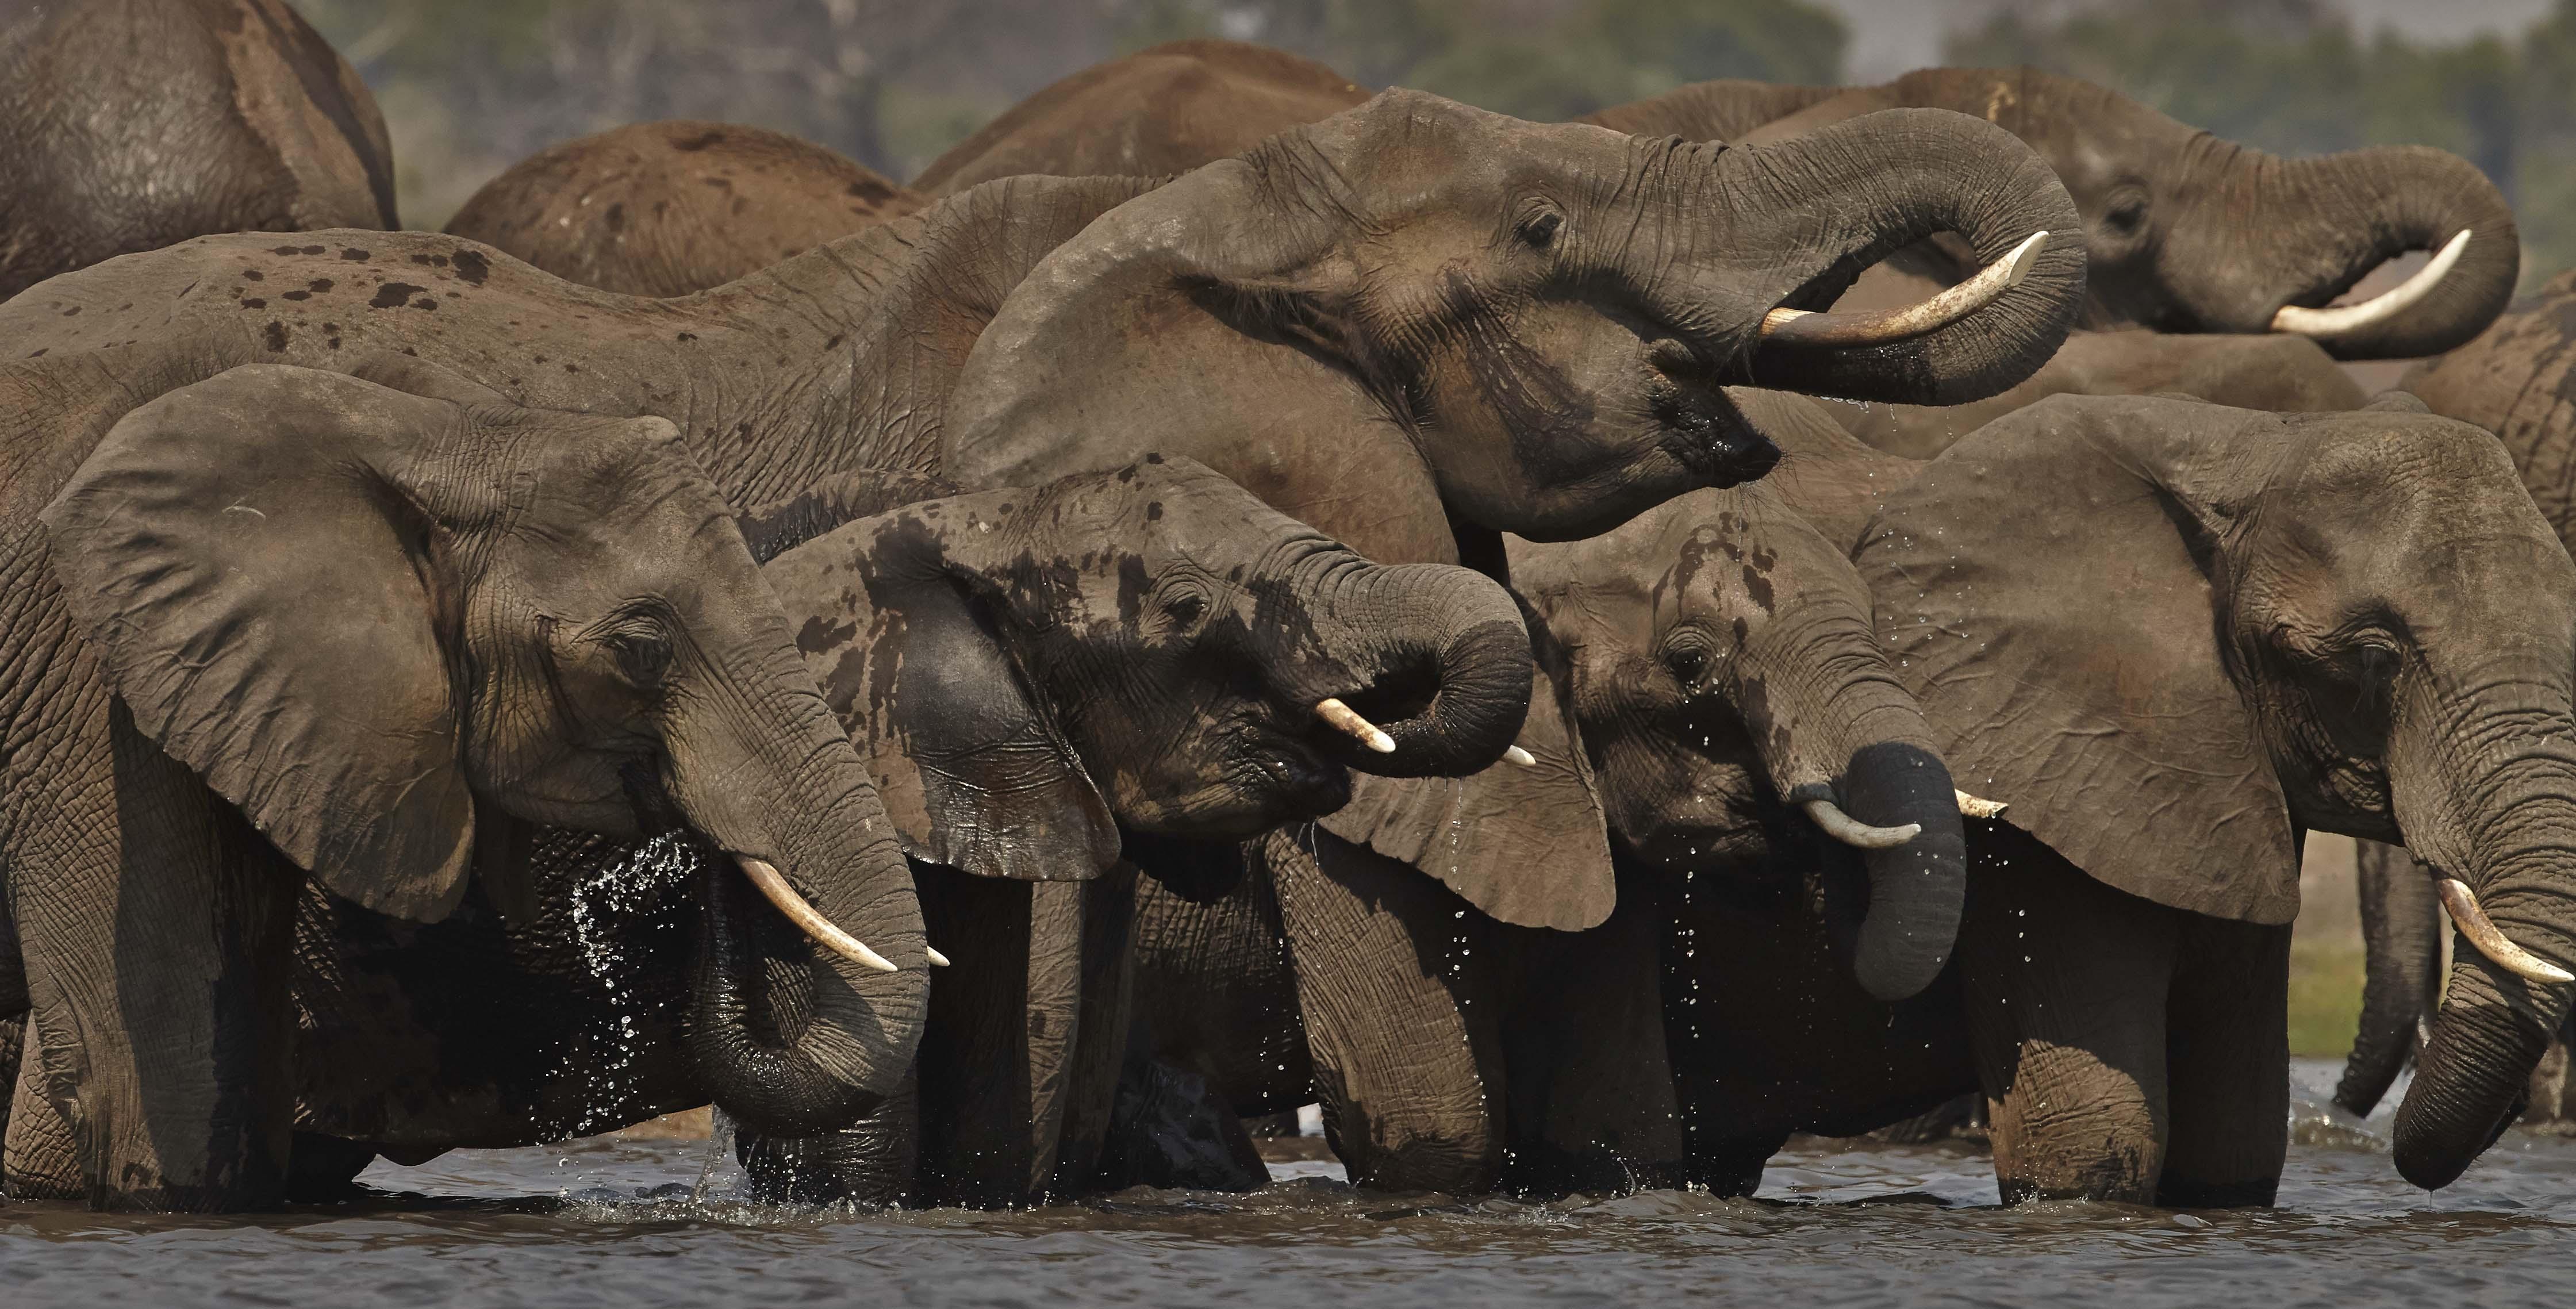 Elephants photographed by John Wright